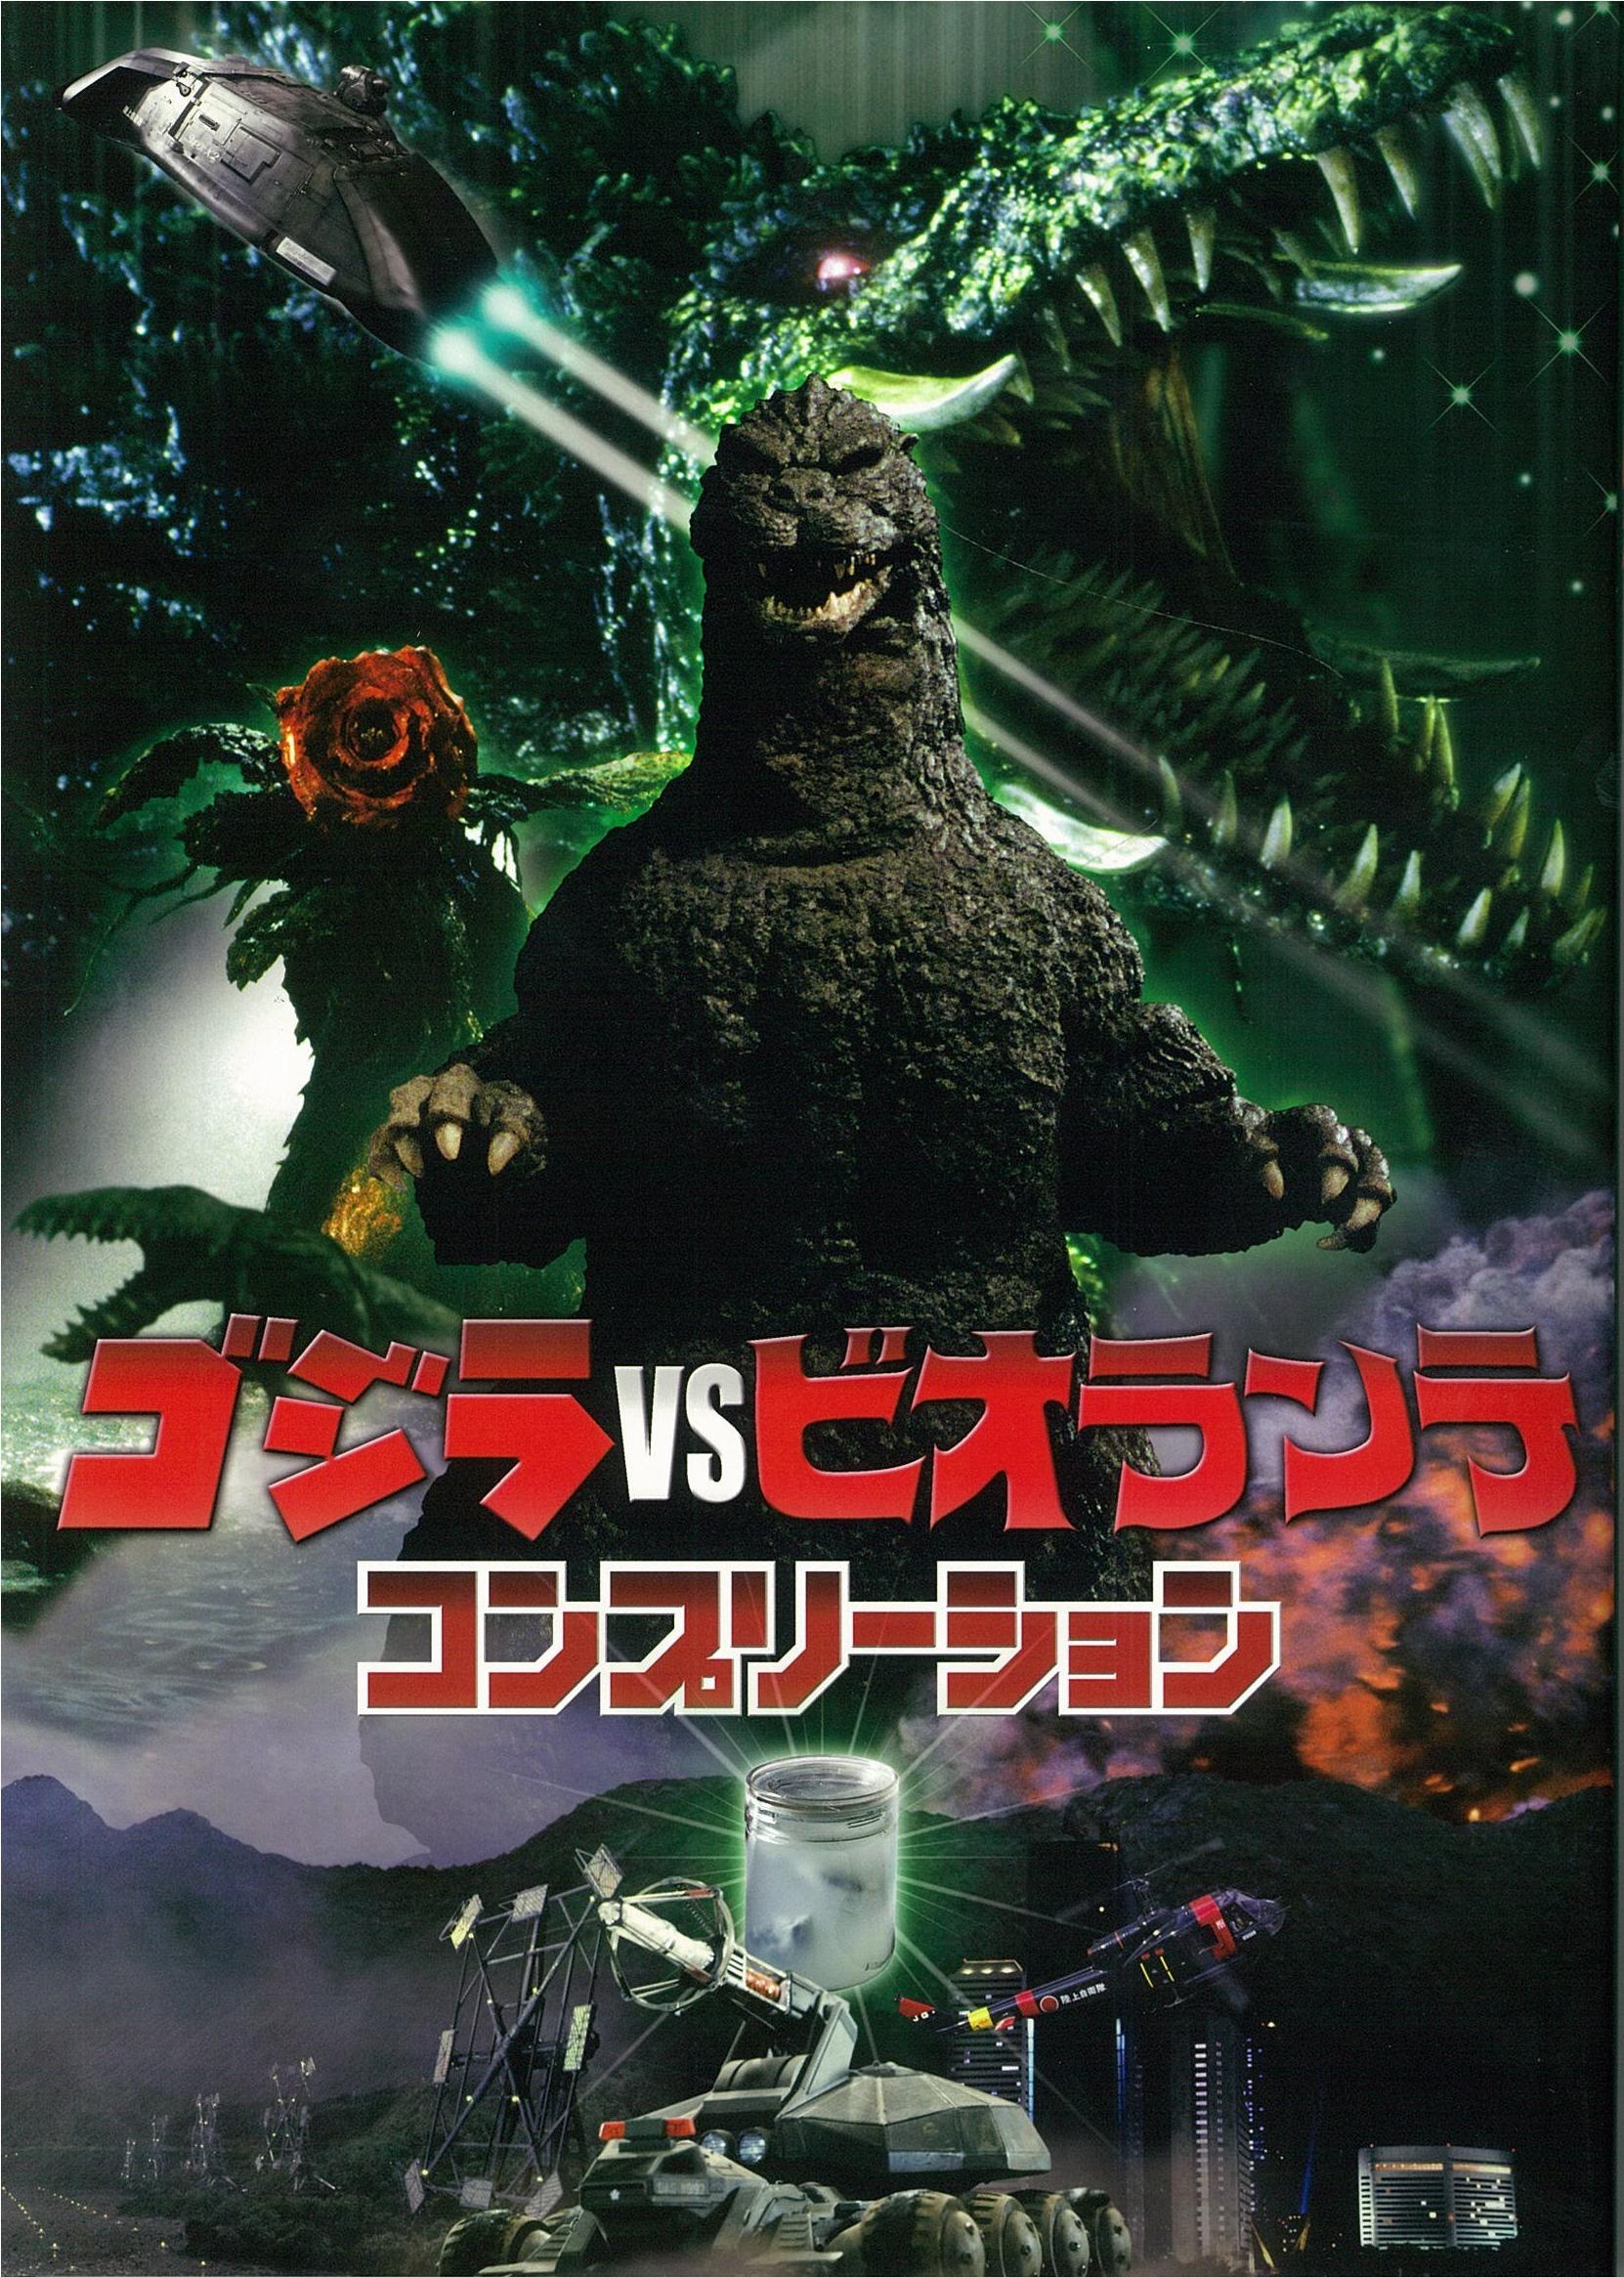 Godzilla vs. Biollante Completion | Gojipedia | FANDOM powered by ...